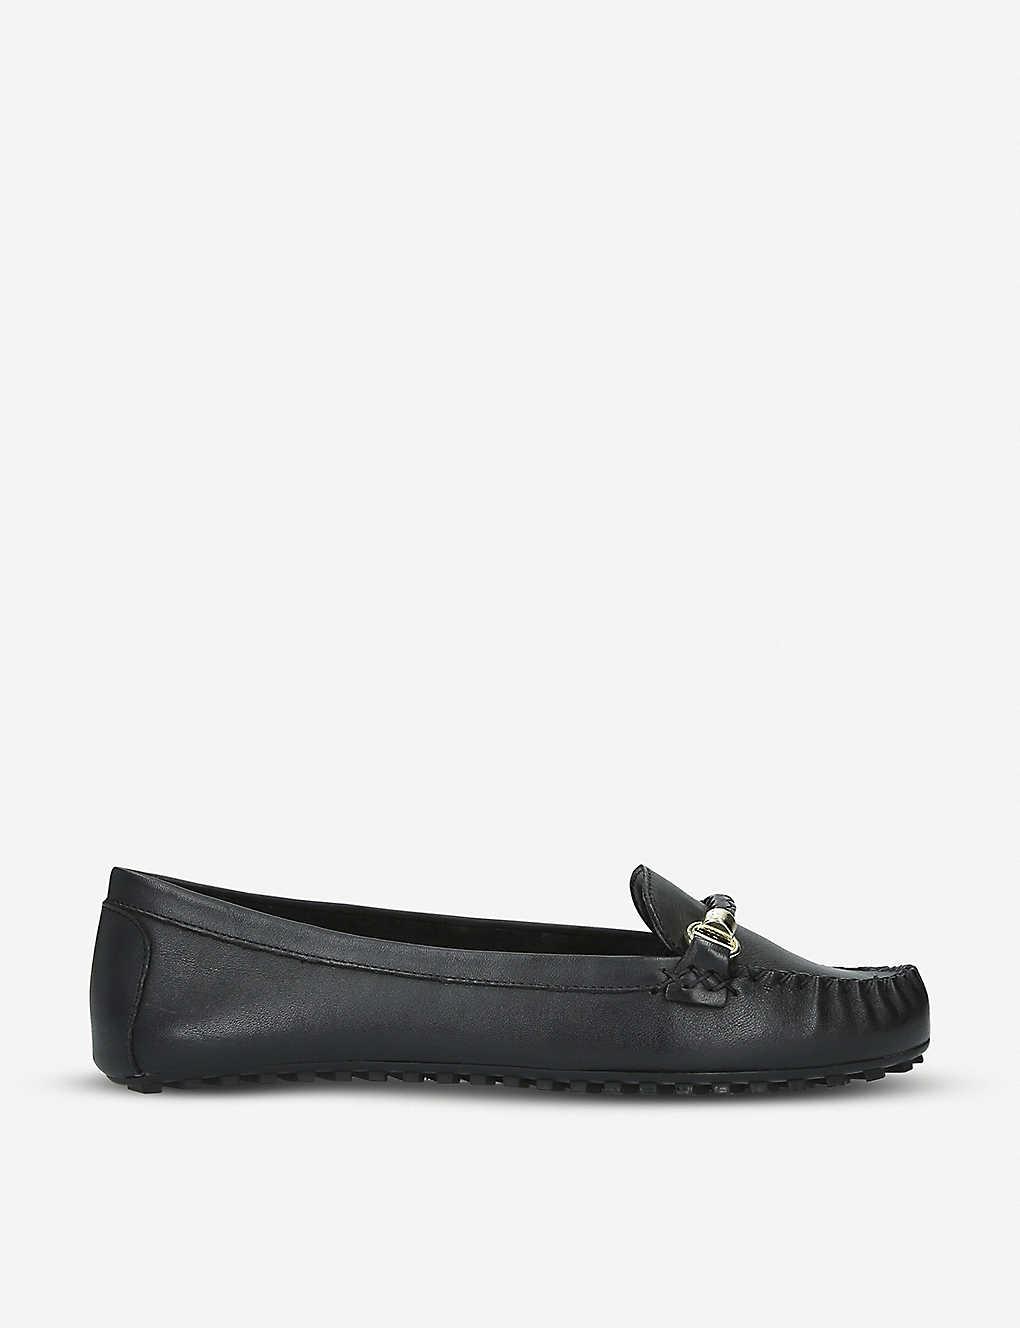 05f7e29e3 ALDO - Maocien leather loafers | Selfridges.com